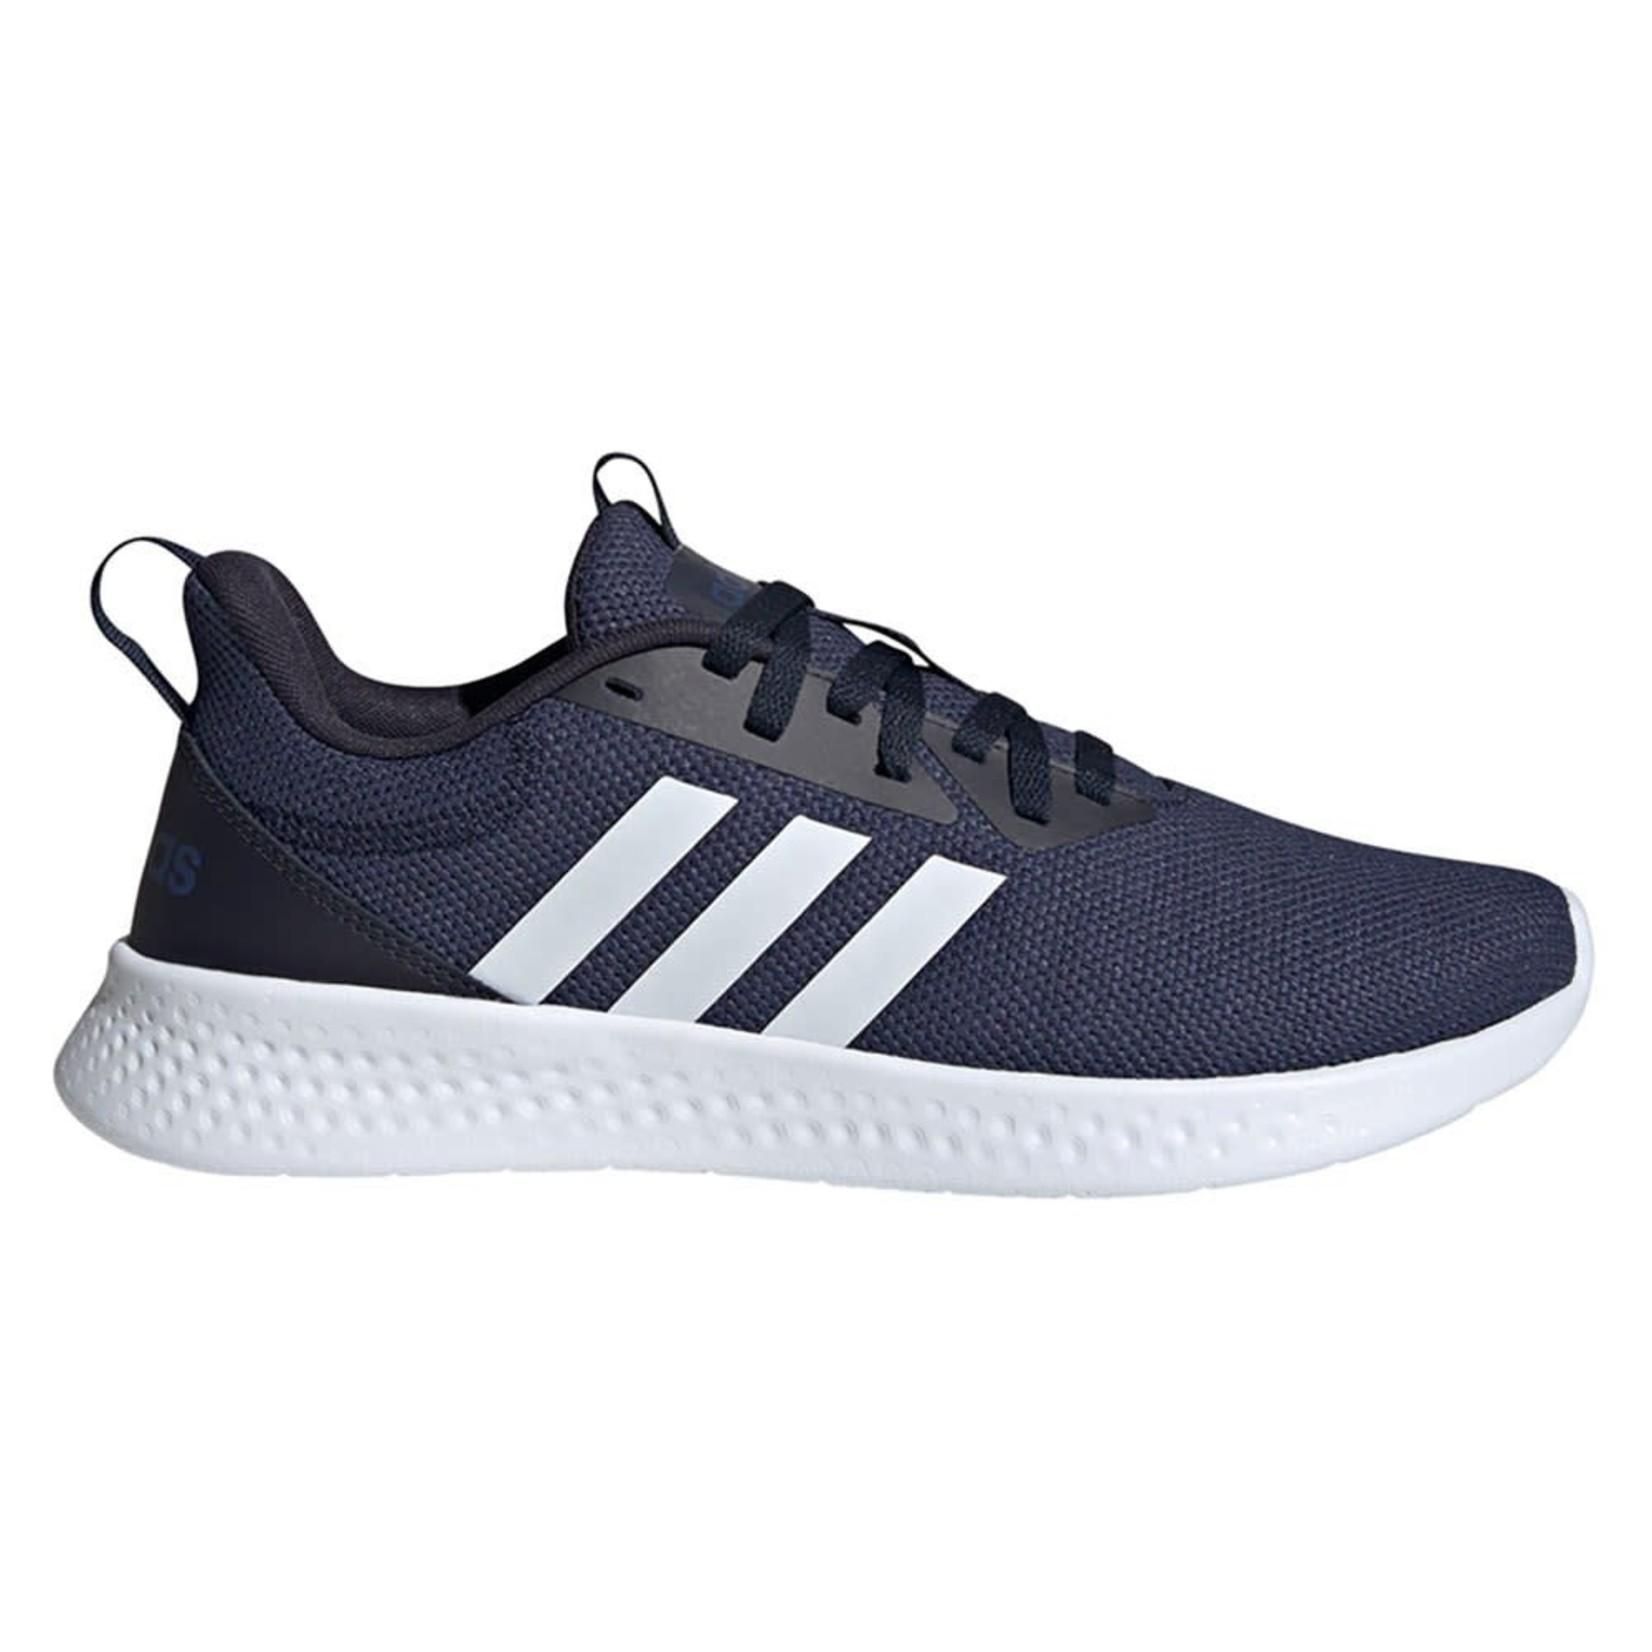 Adidas Puremotion Men's Runner